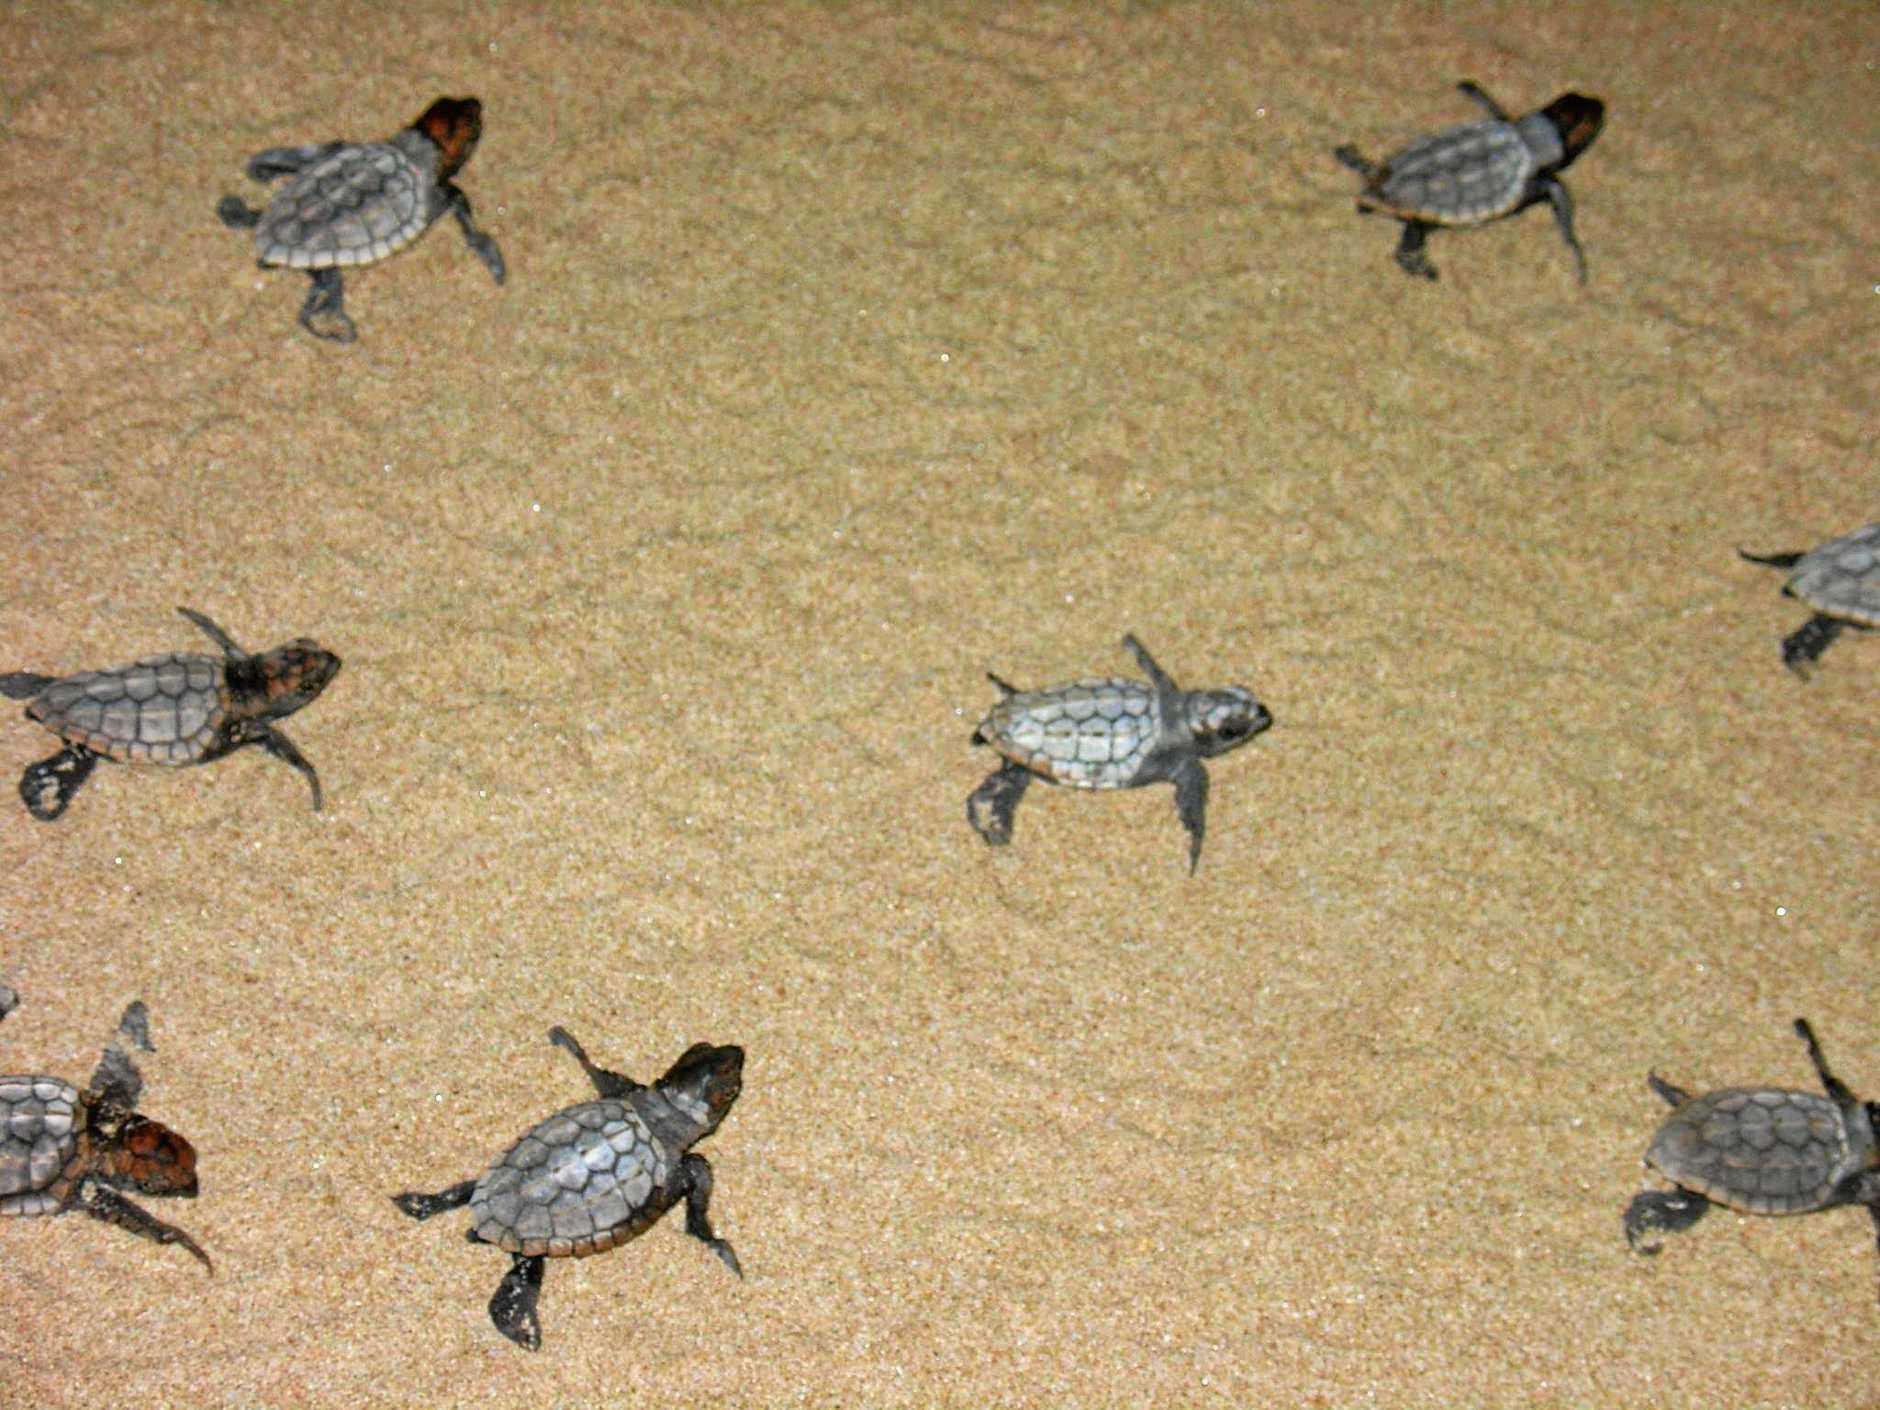 SUCCESS: Loggerhead hatchlings making their way across the sand.